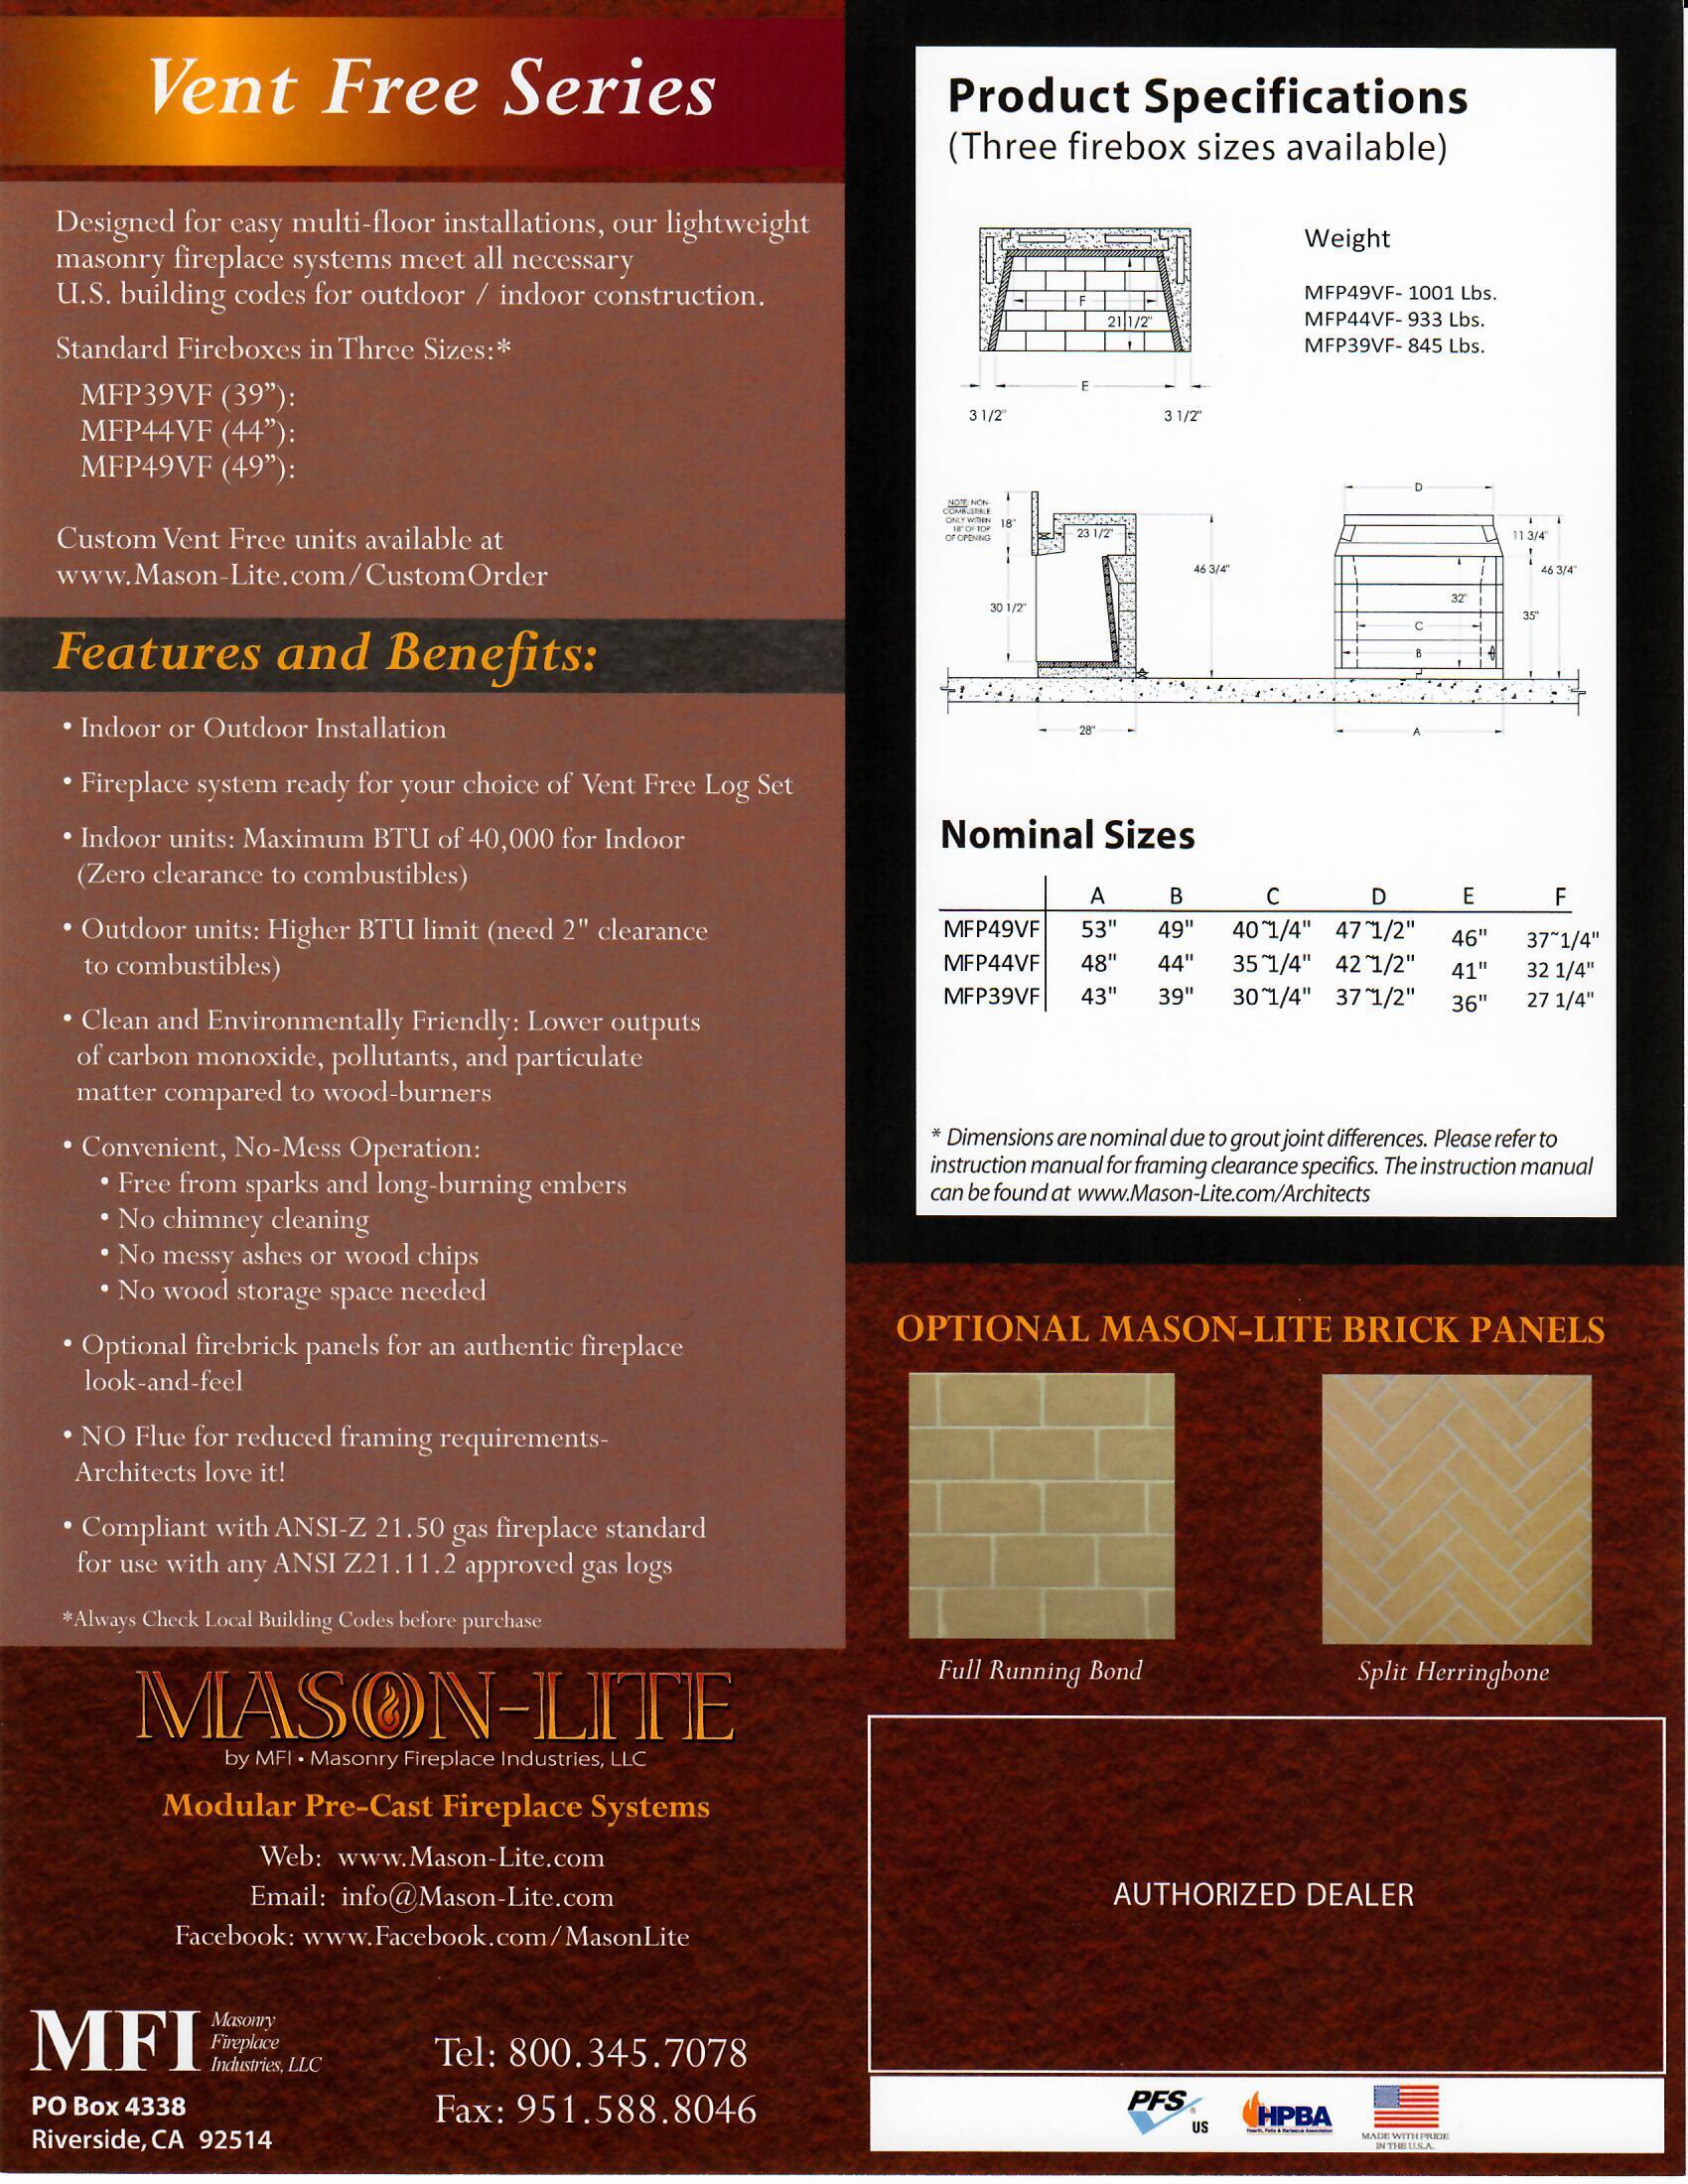 Mason-Lite Vent Free Information Sheet